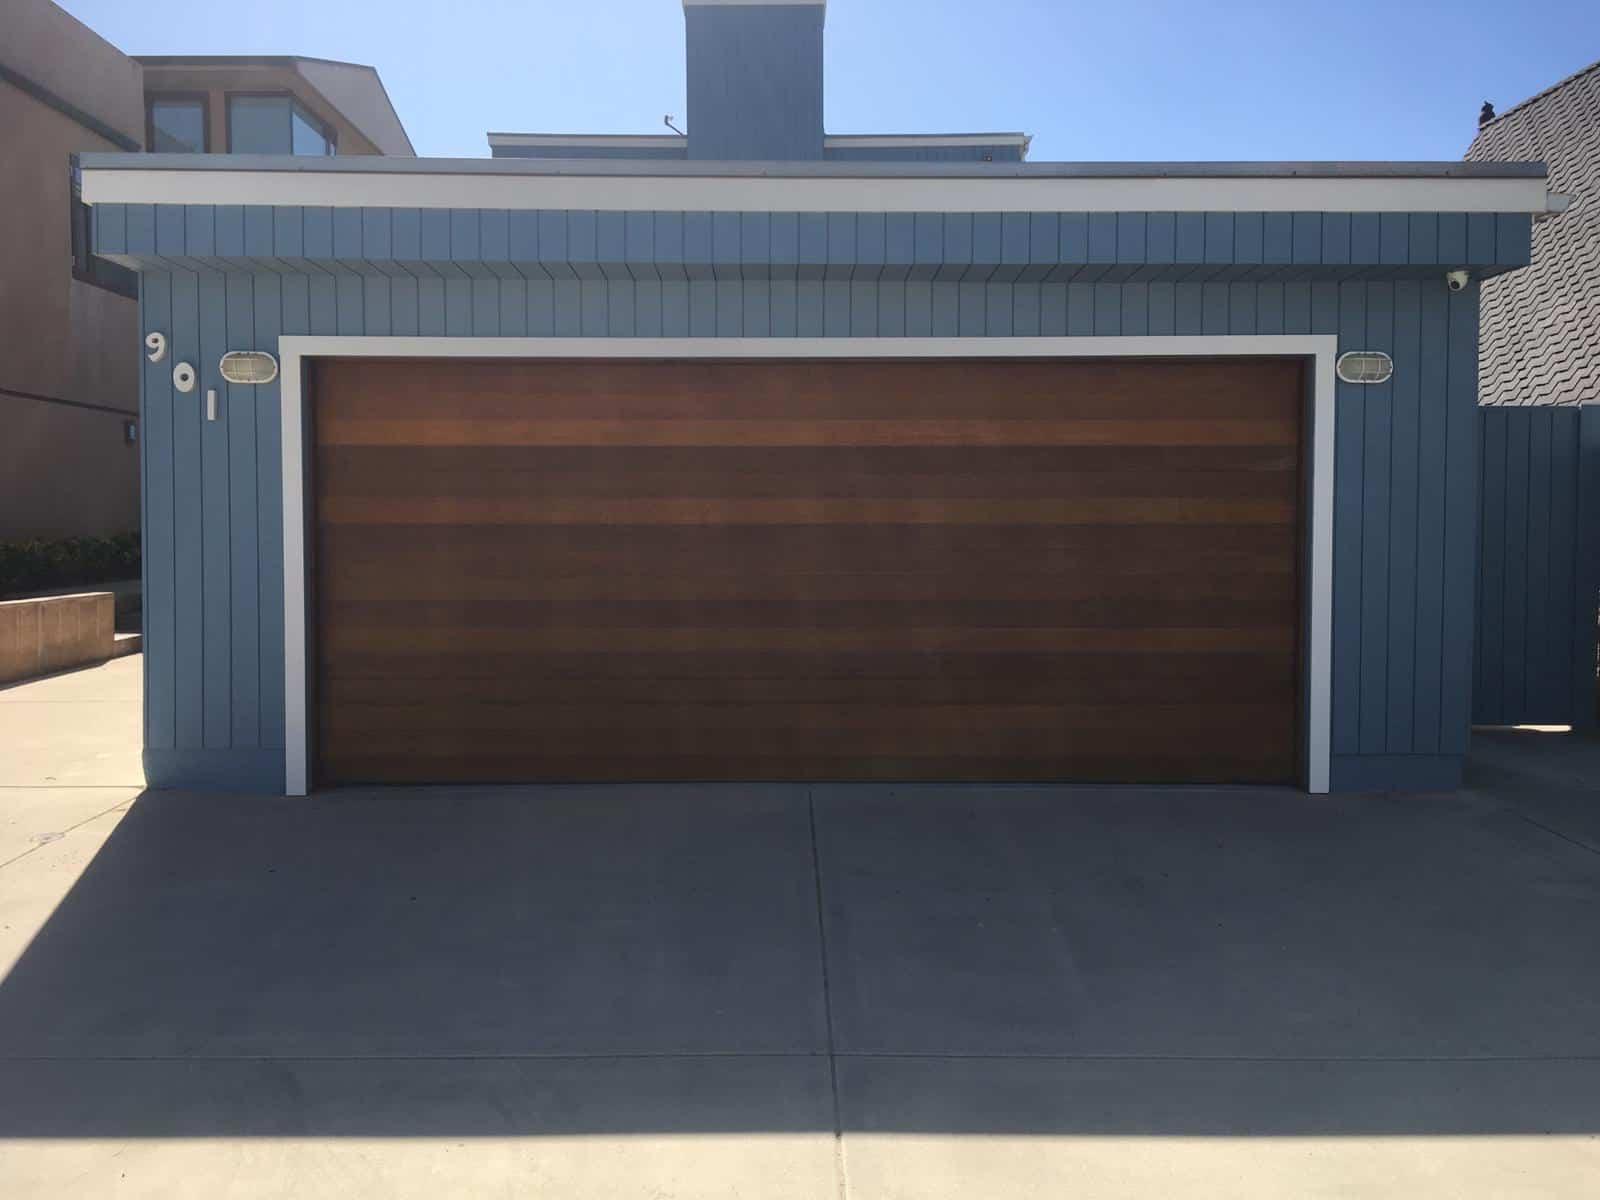 Hillsborough CA Garage Door Repair & Replacement